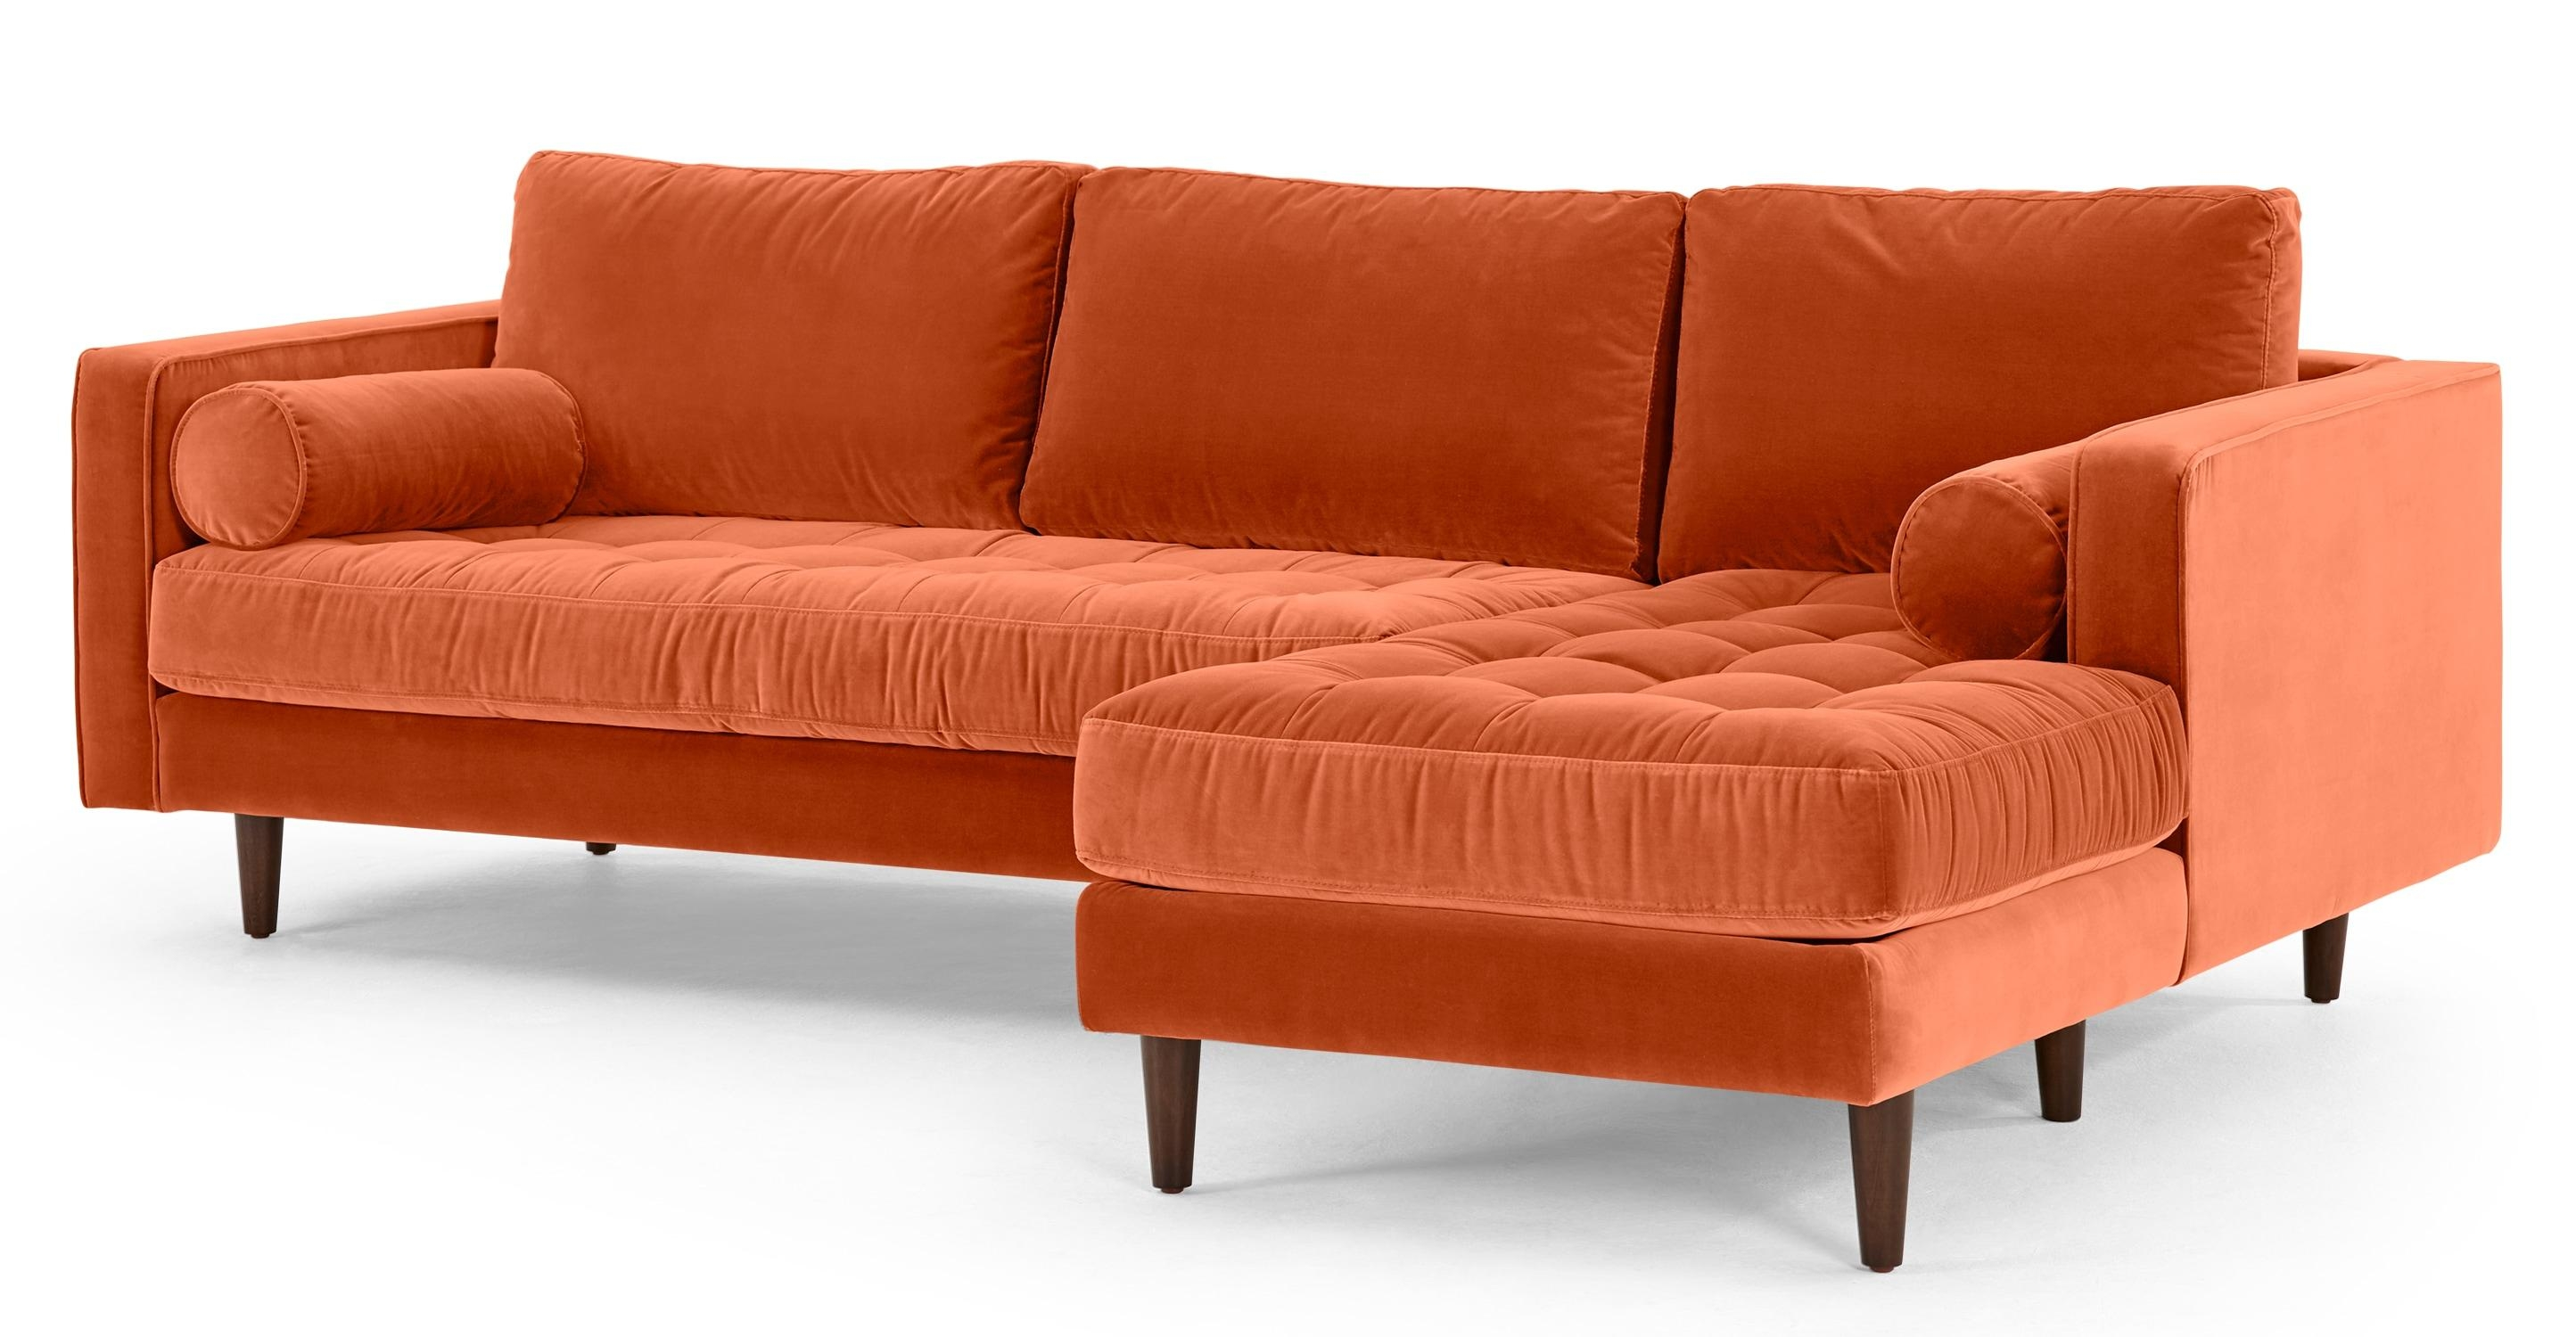 Unique Orange Sofa | Cochabamba Within Burnt Orange Sofas (View 11 of 20)